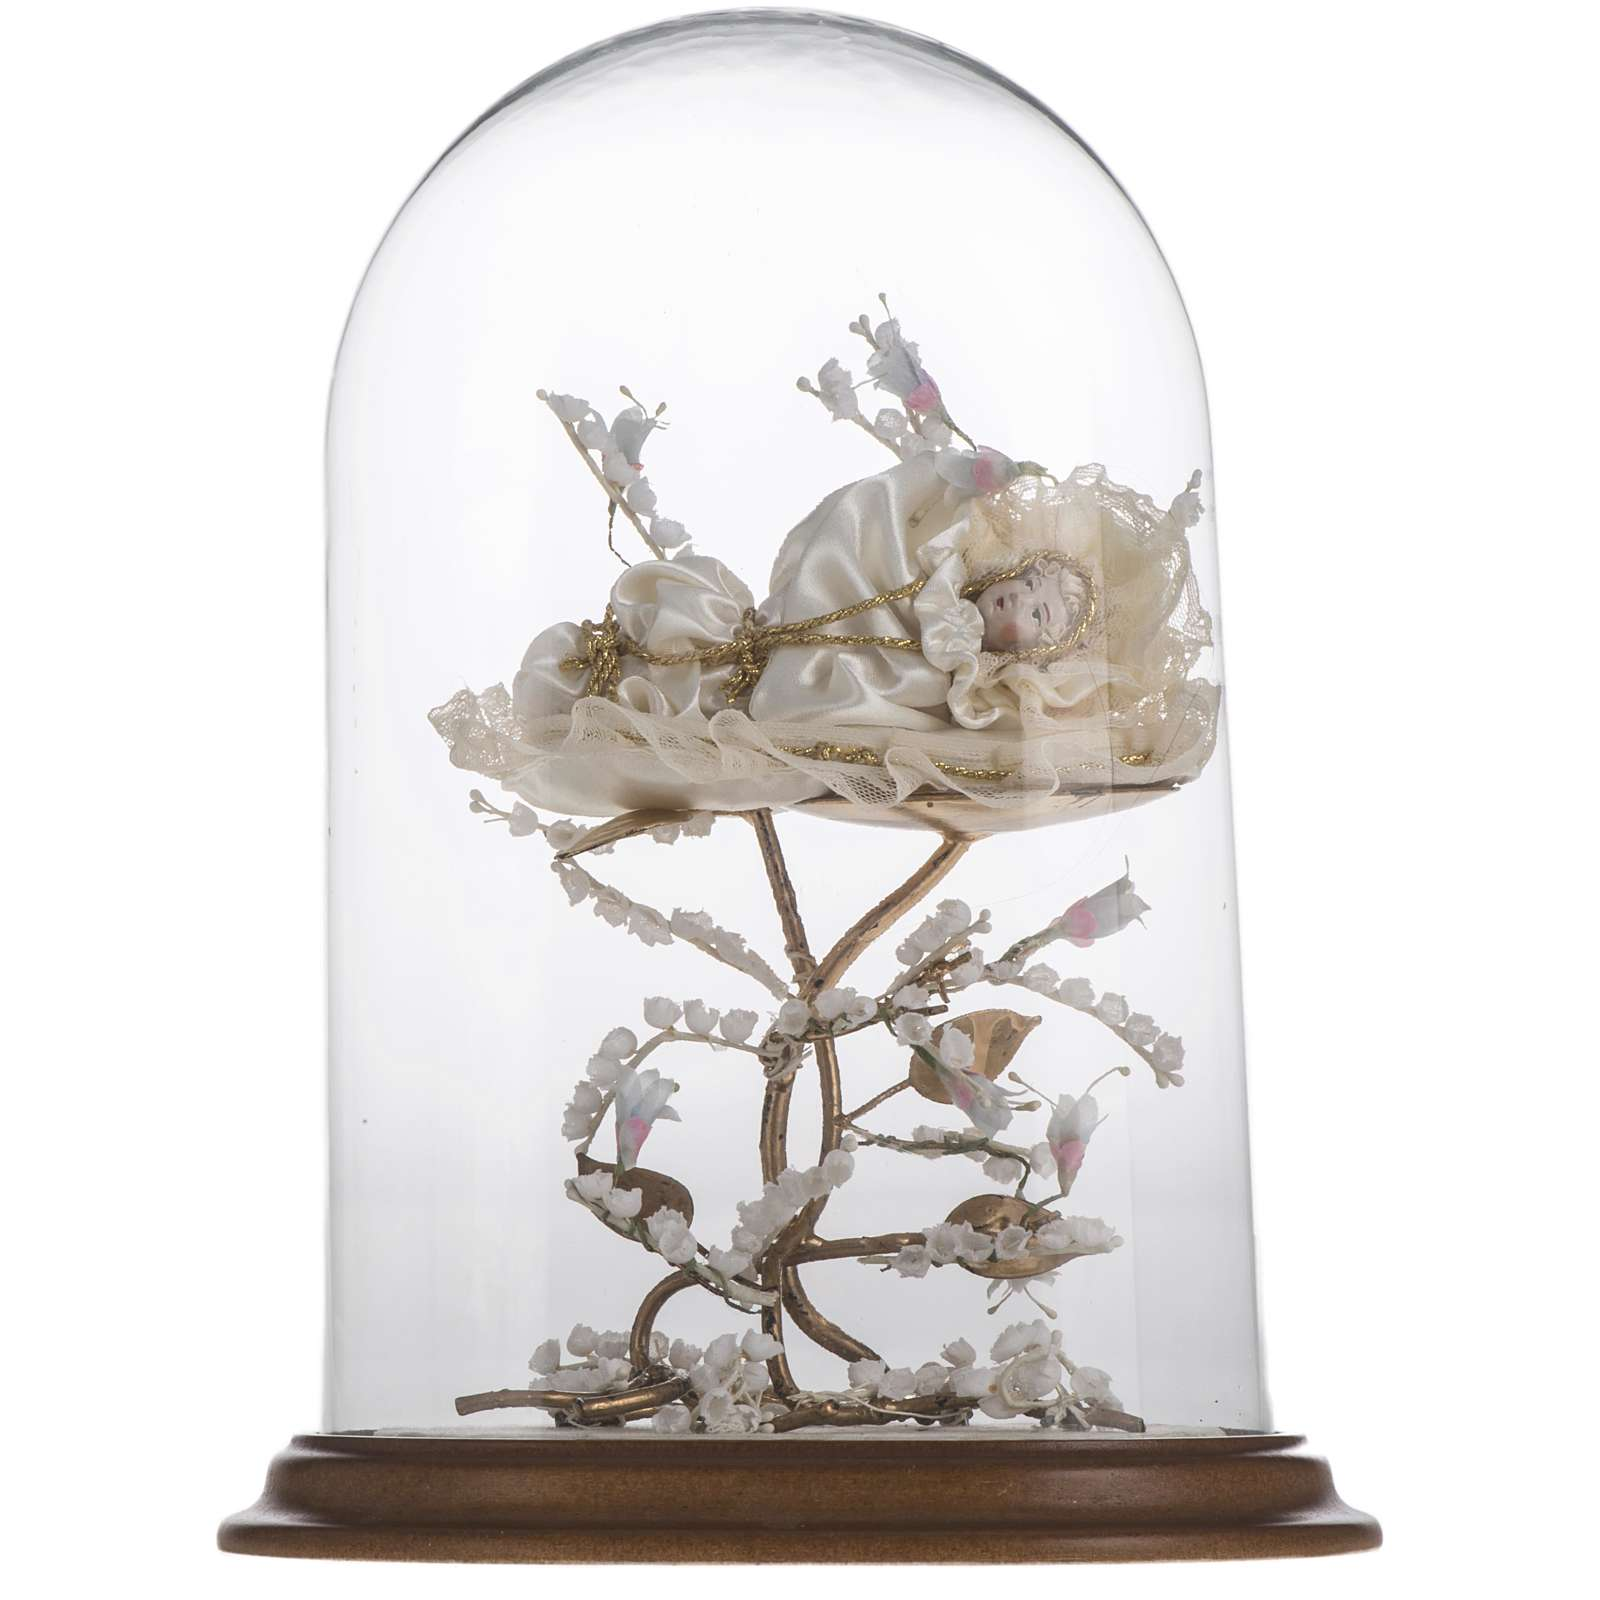 Maria bambina statua terracotta cm 18 campana di vetro 35X25 4